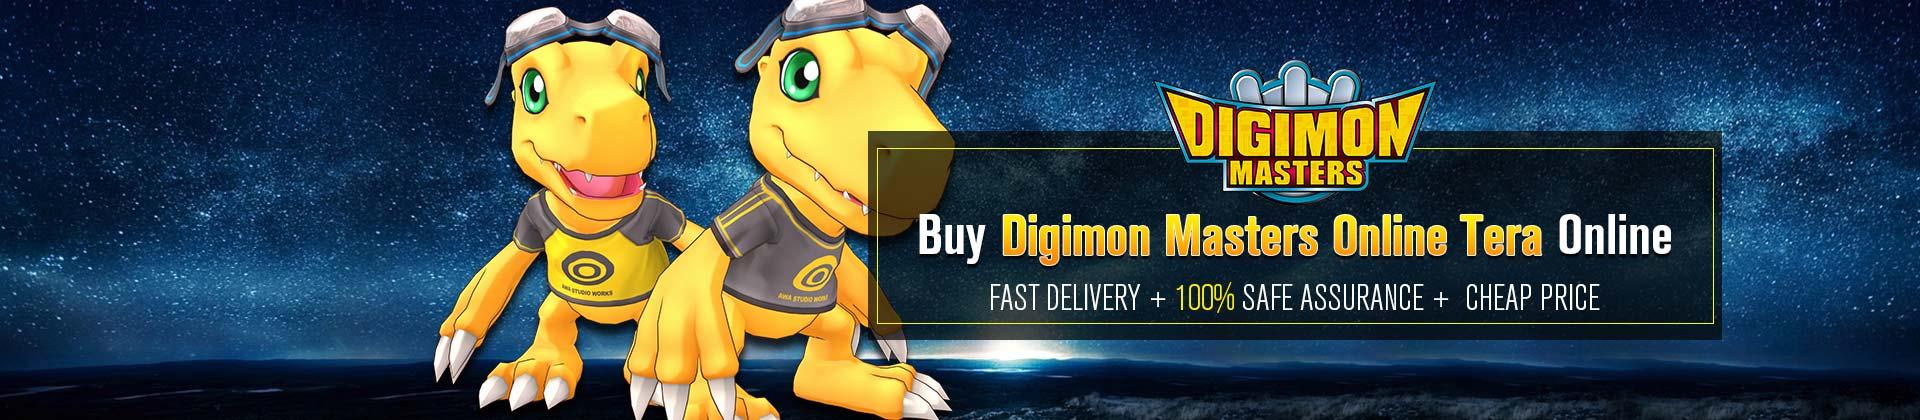 Digimon Masters Online Tera